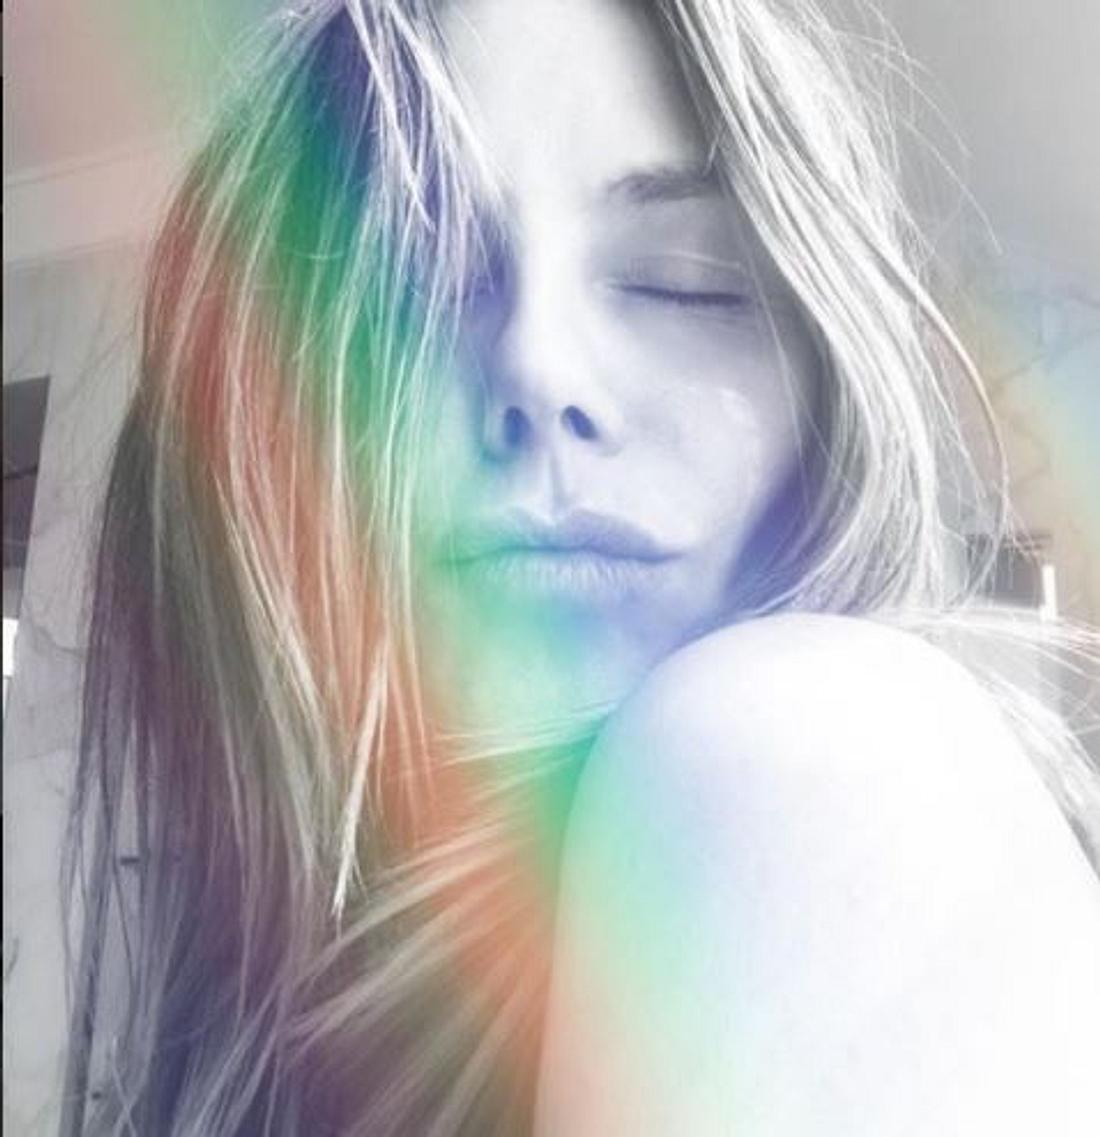 Heidi Klum: Heißes Duschvideo